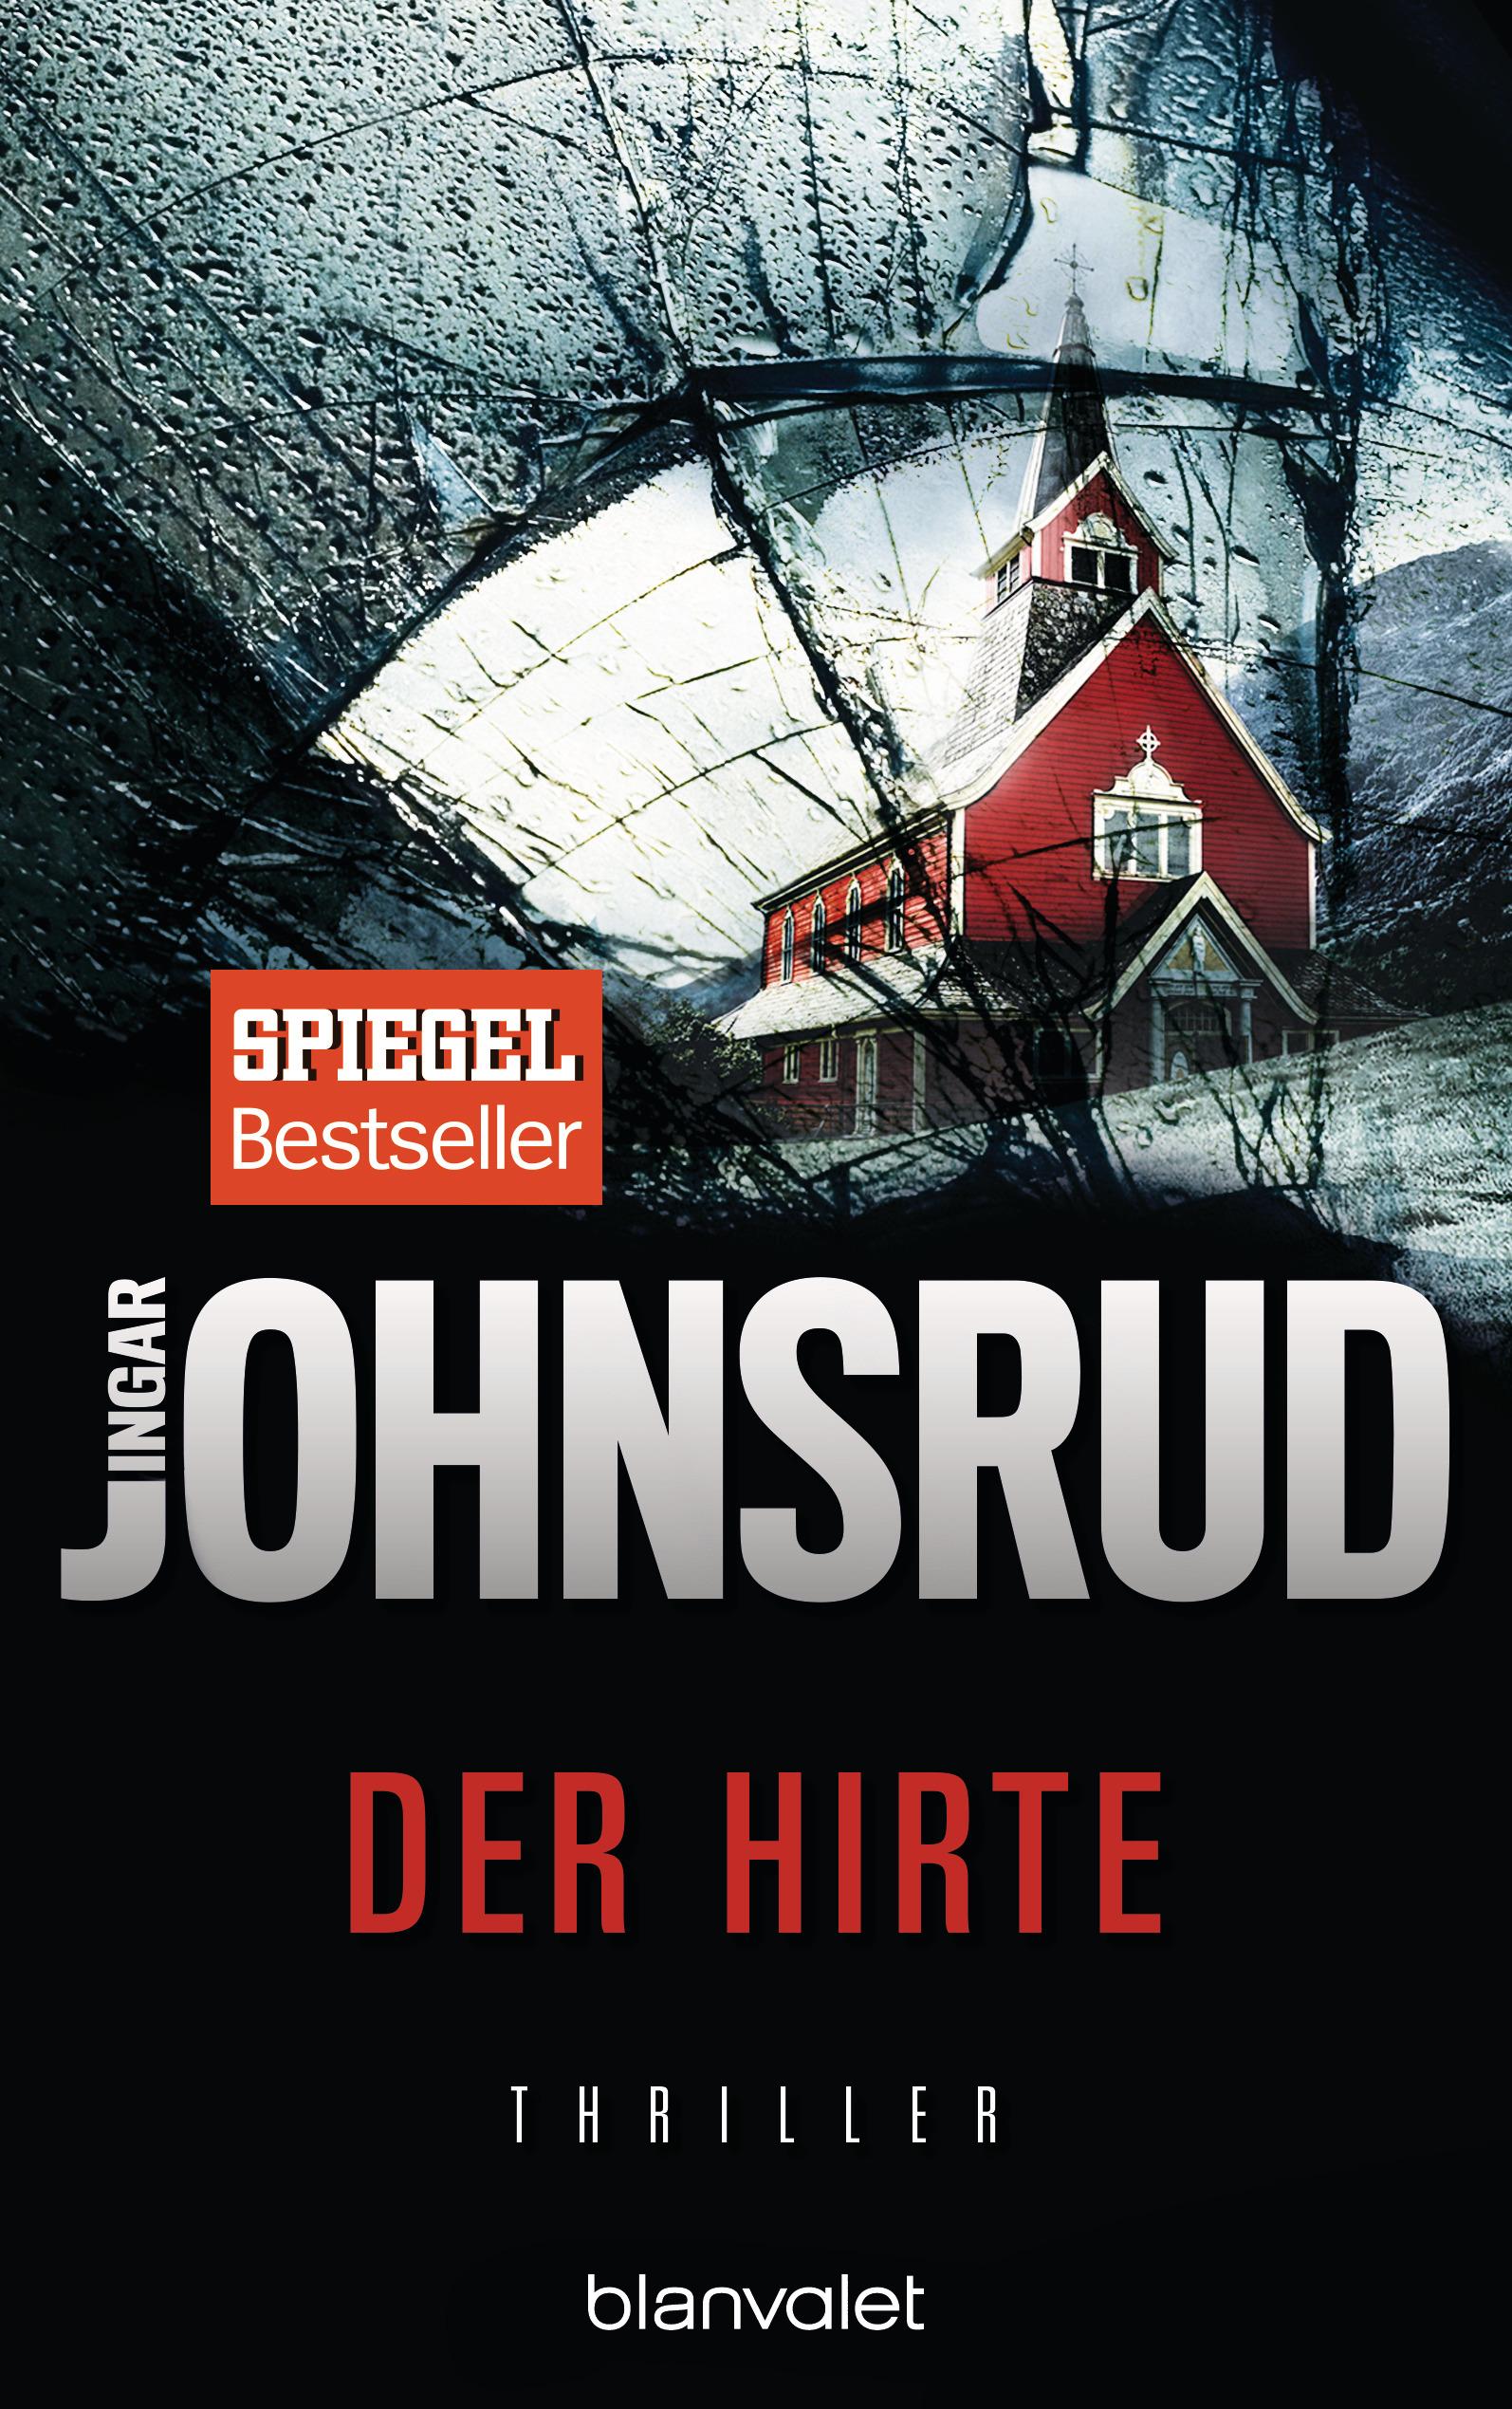 Ingar-Johnsrud-Der-Hirte9783764505875